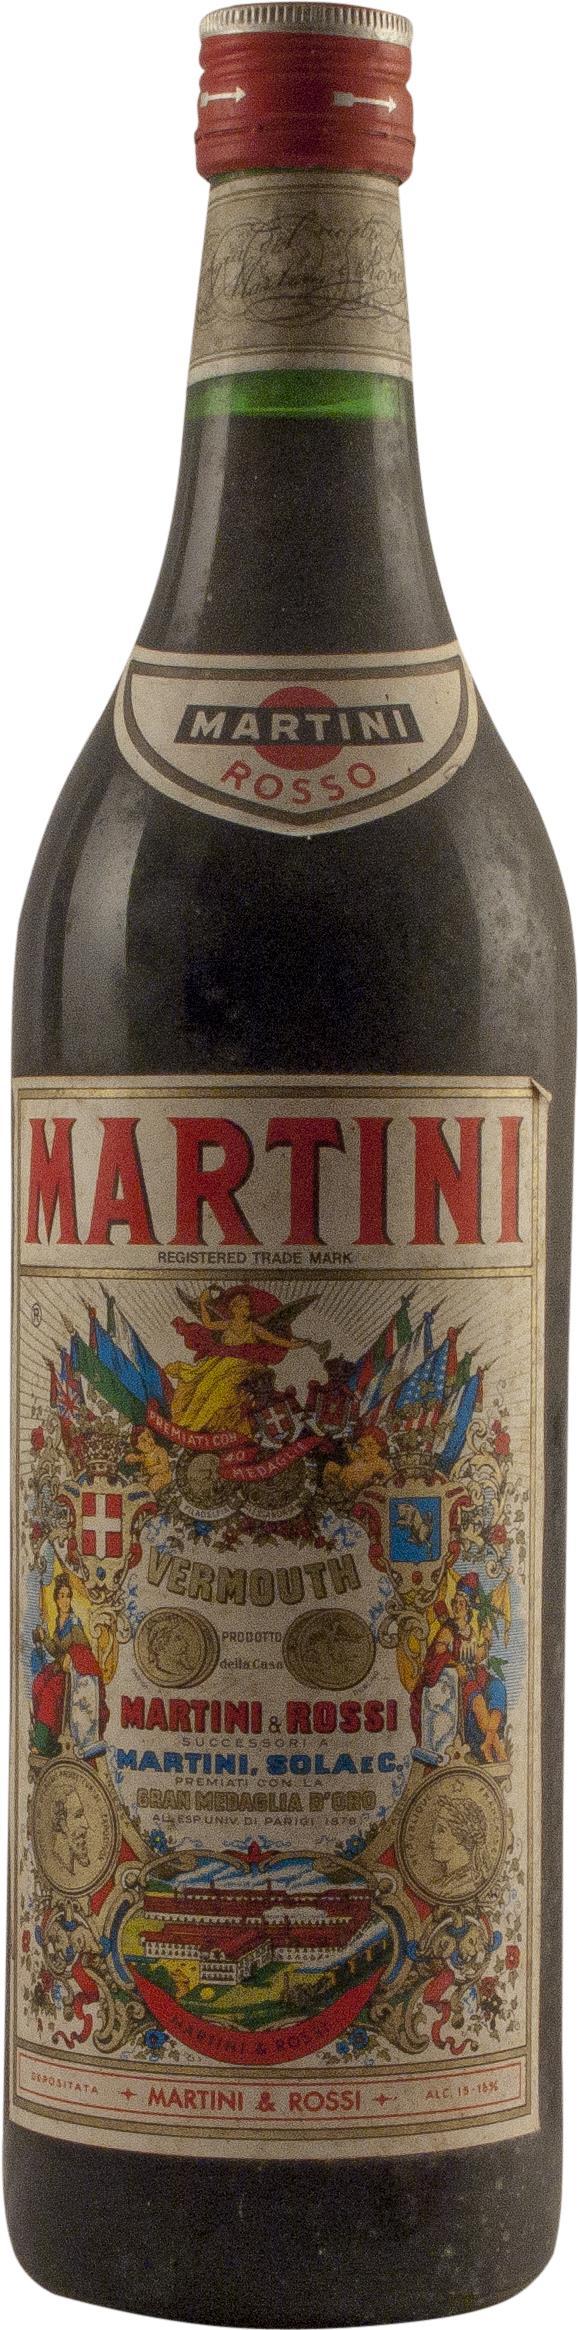 Martini Vermouth 1970s (7720)